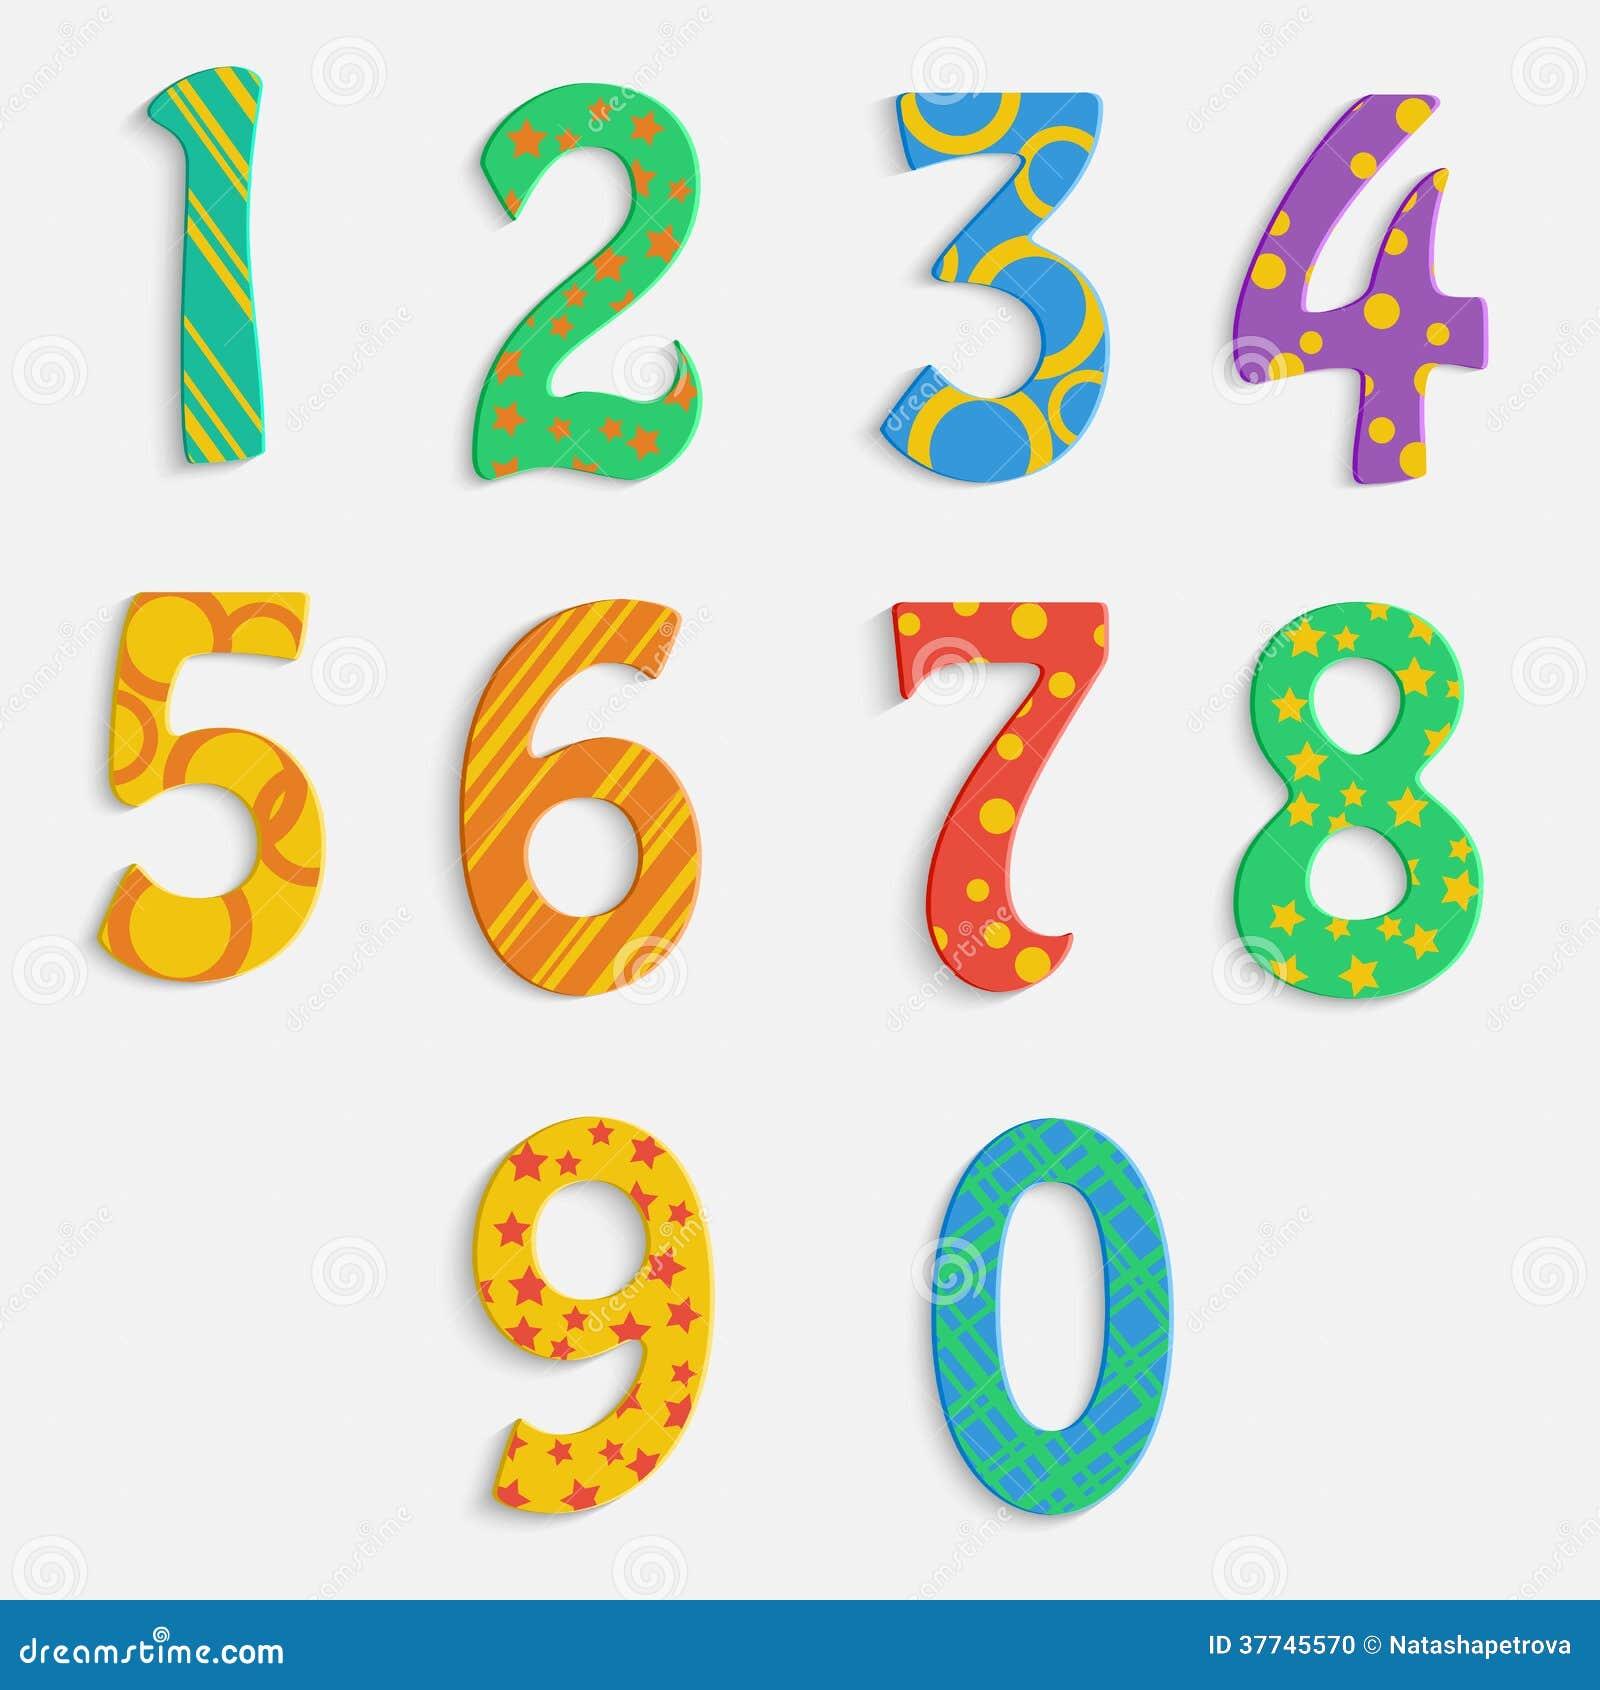 Set Of Colorful Digits Stock Photo - Image: 37745570